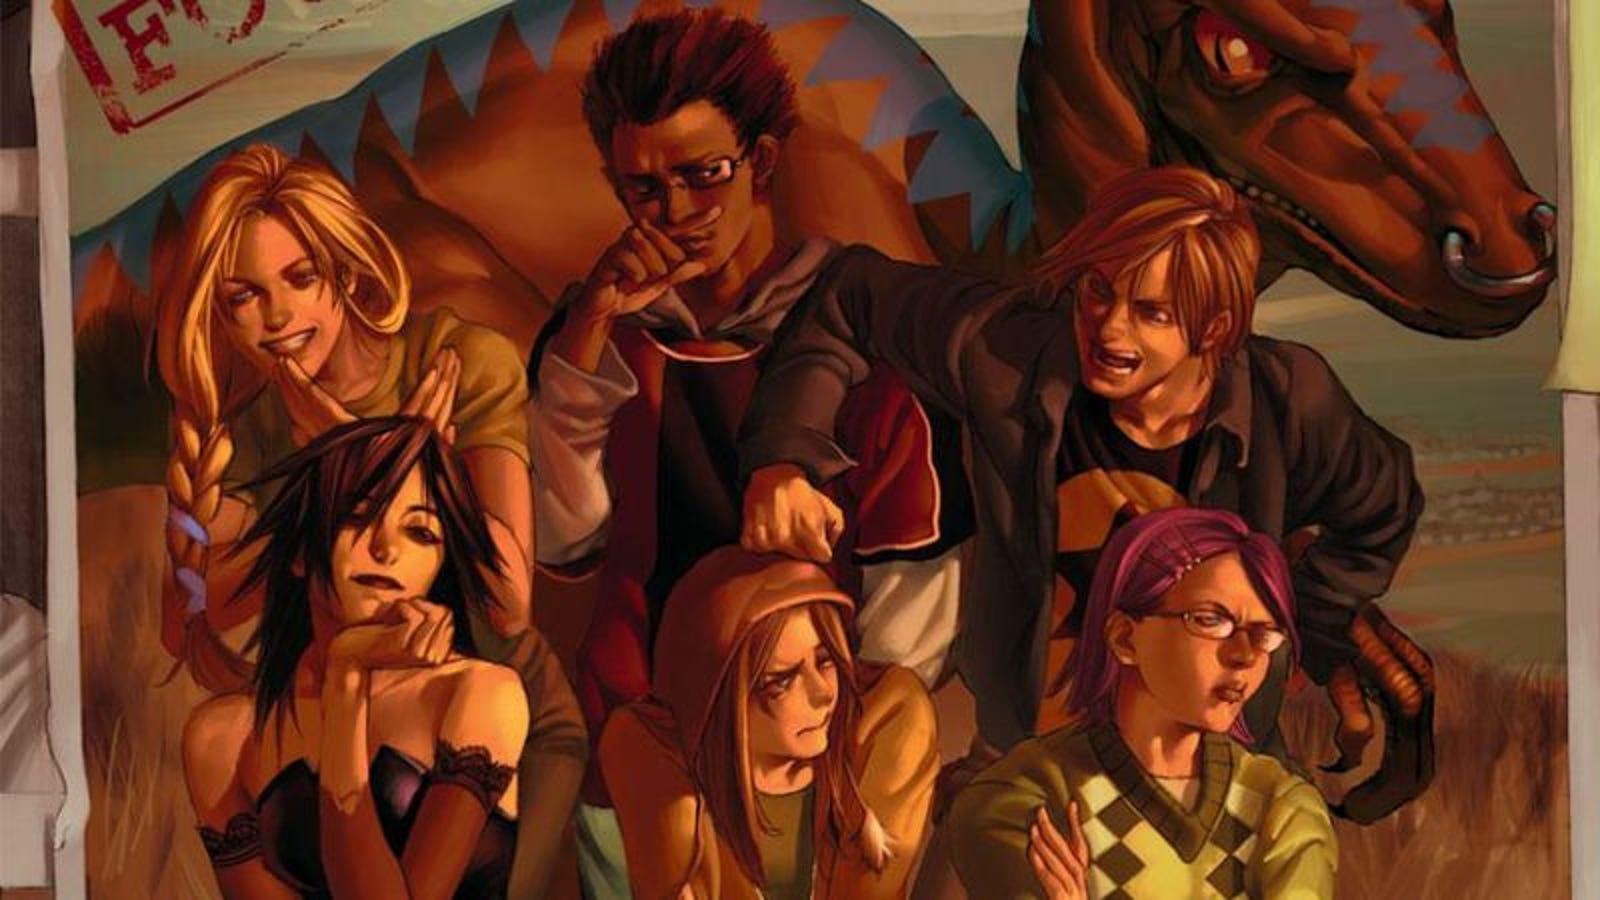 Wonderful Wallpaper Marvel Runaways - rccx68zgzszpf7ldhcwd  You Should Have_651291.jpg